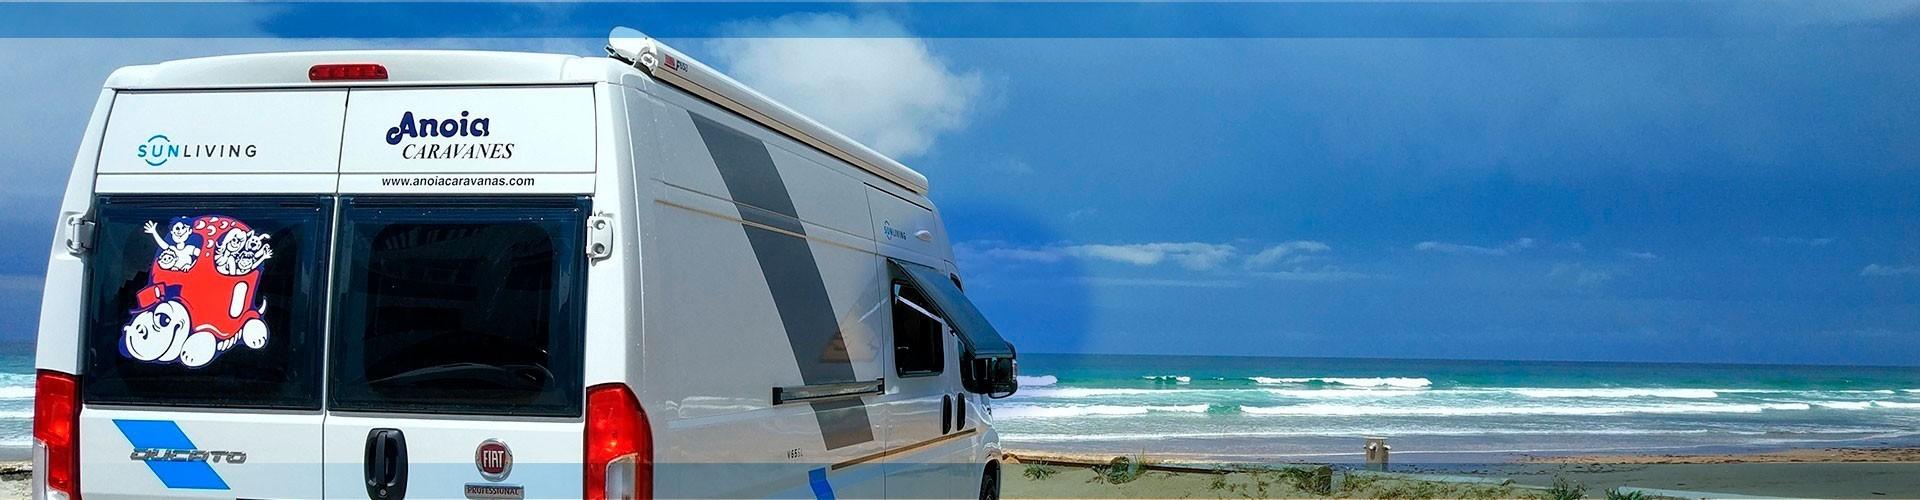 Alquiler Autocaravana Camper - Anoia Caravanas